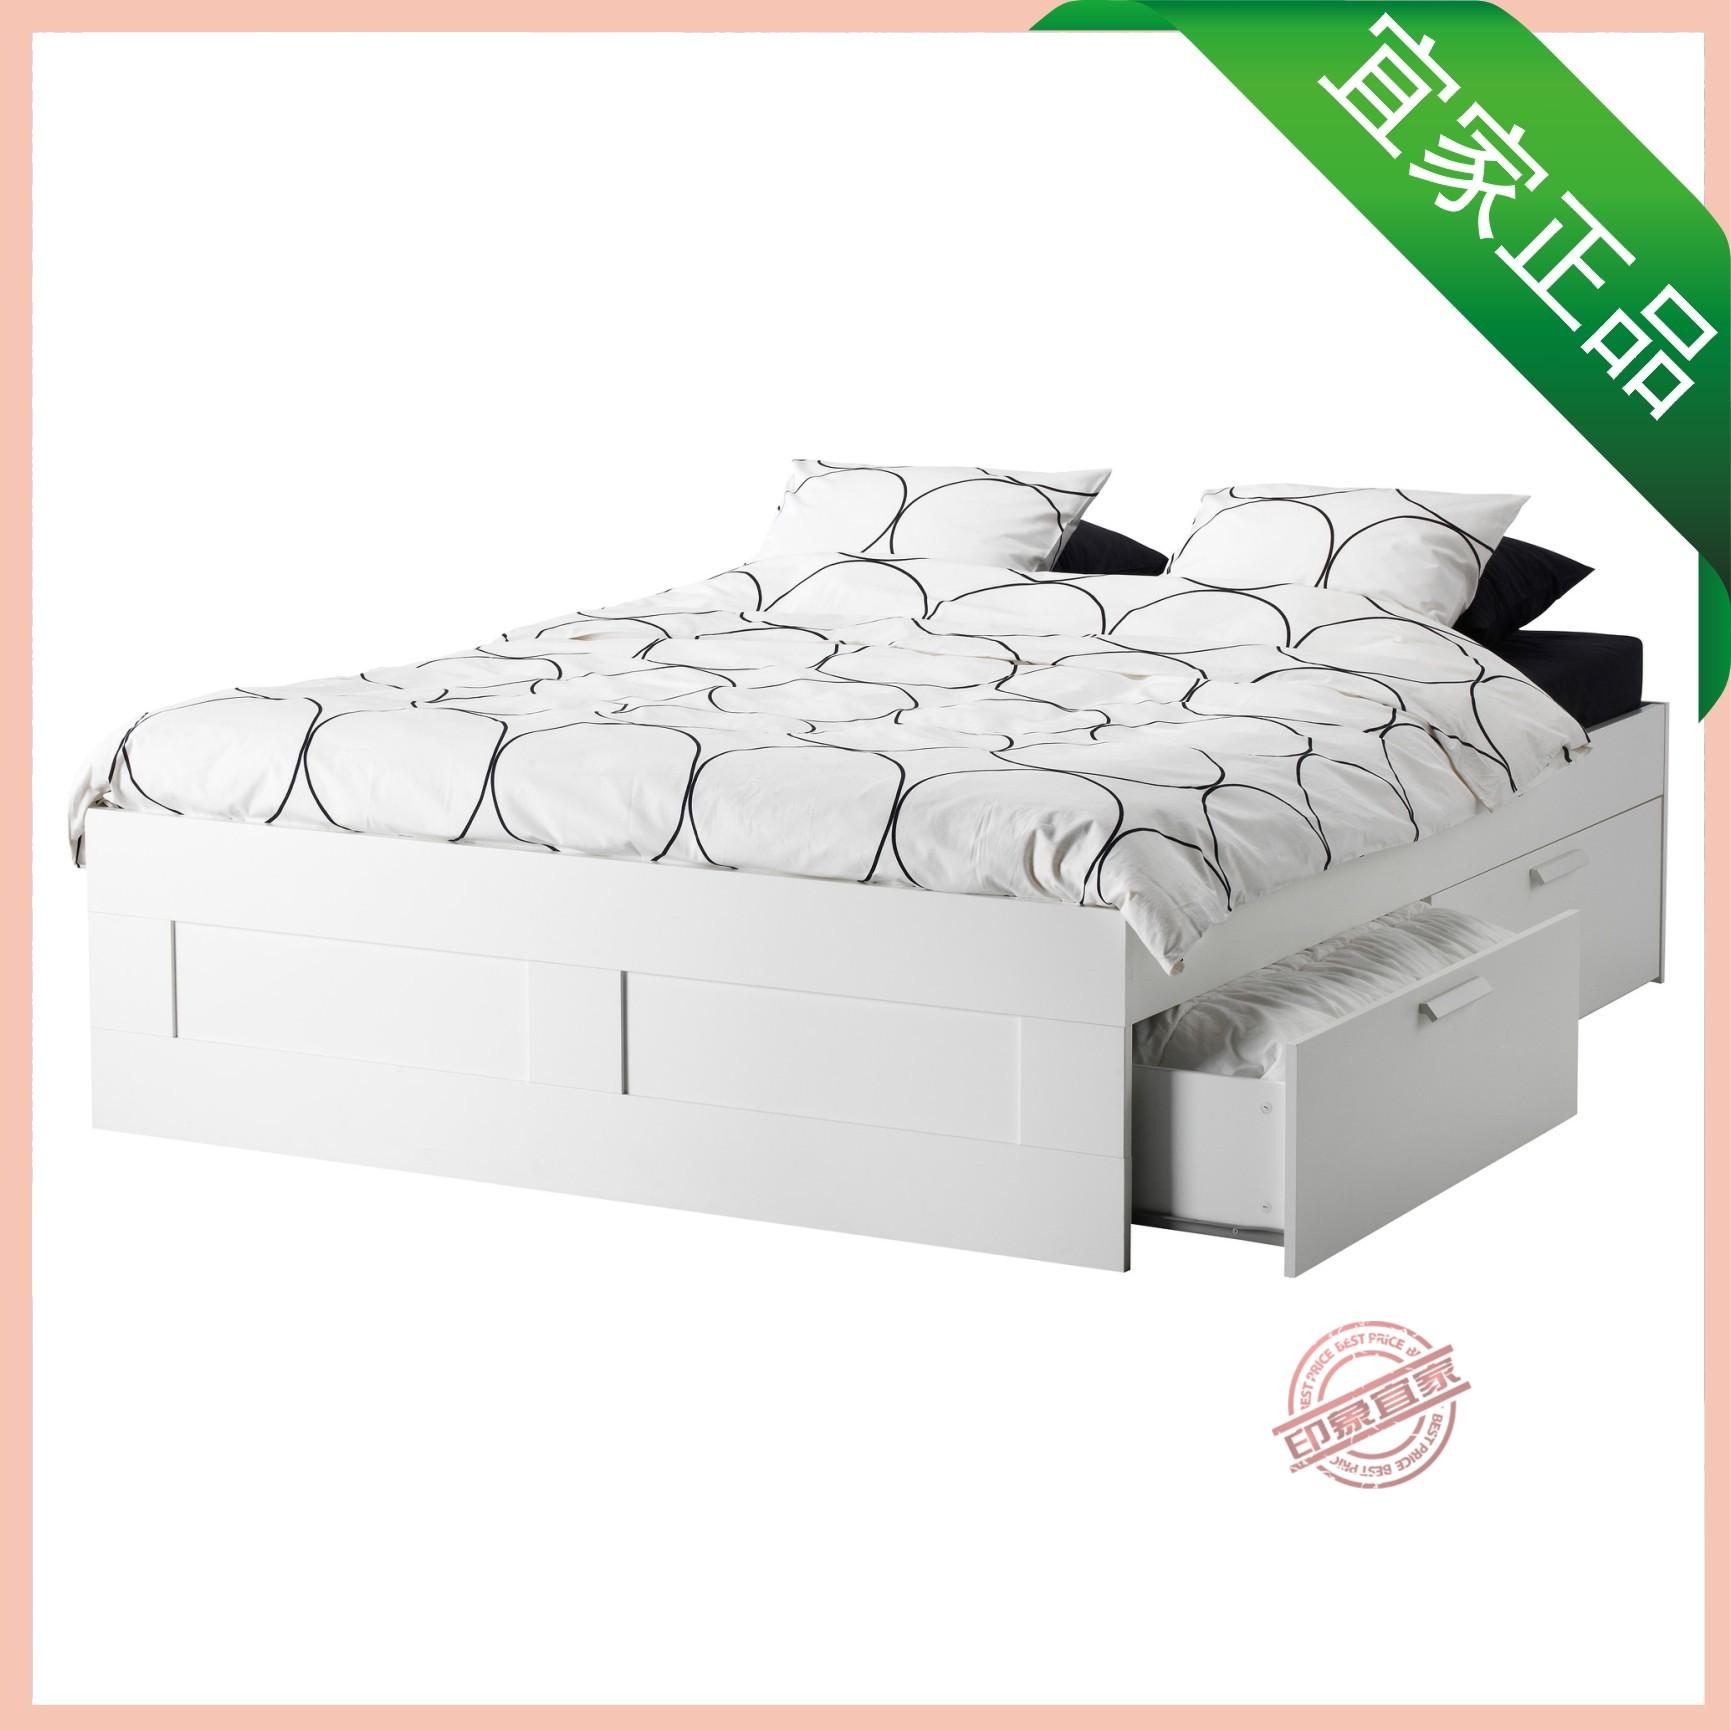 каркас кровати IKEA ИКЕА Браун Белый 199.029.43 кровати IKEA кадра с хранения покупки кровати